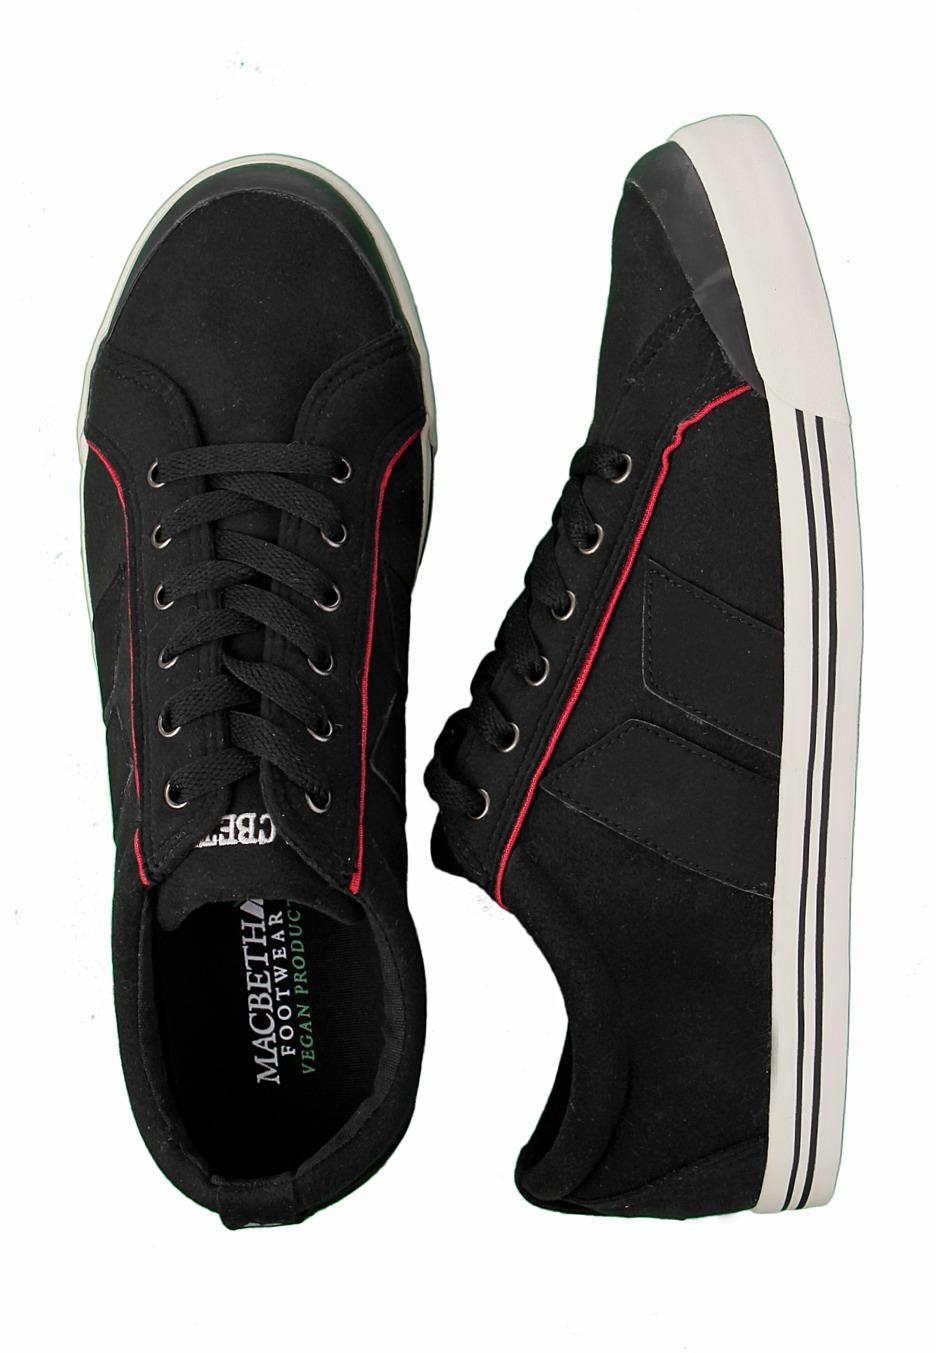 Macbeth - Eliot Premium Black/Cement/Red Synthetic Suede ...